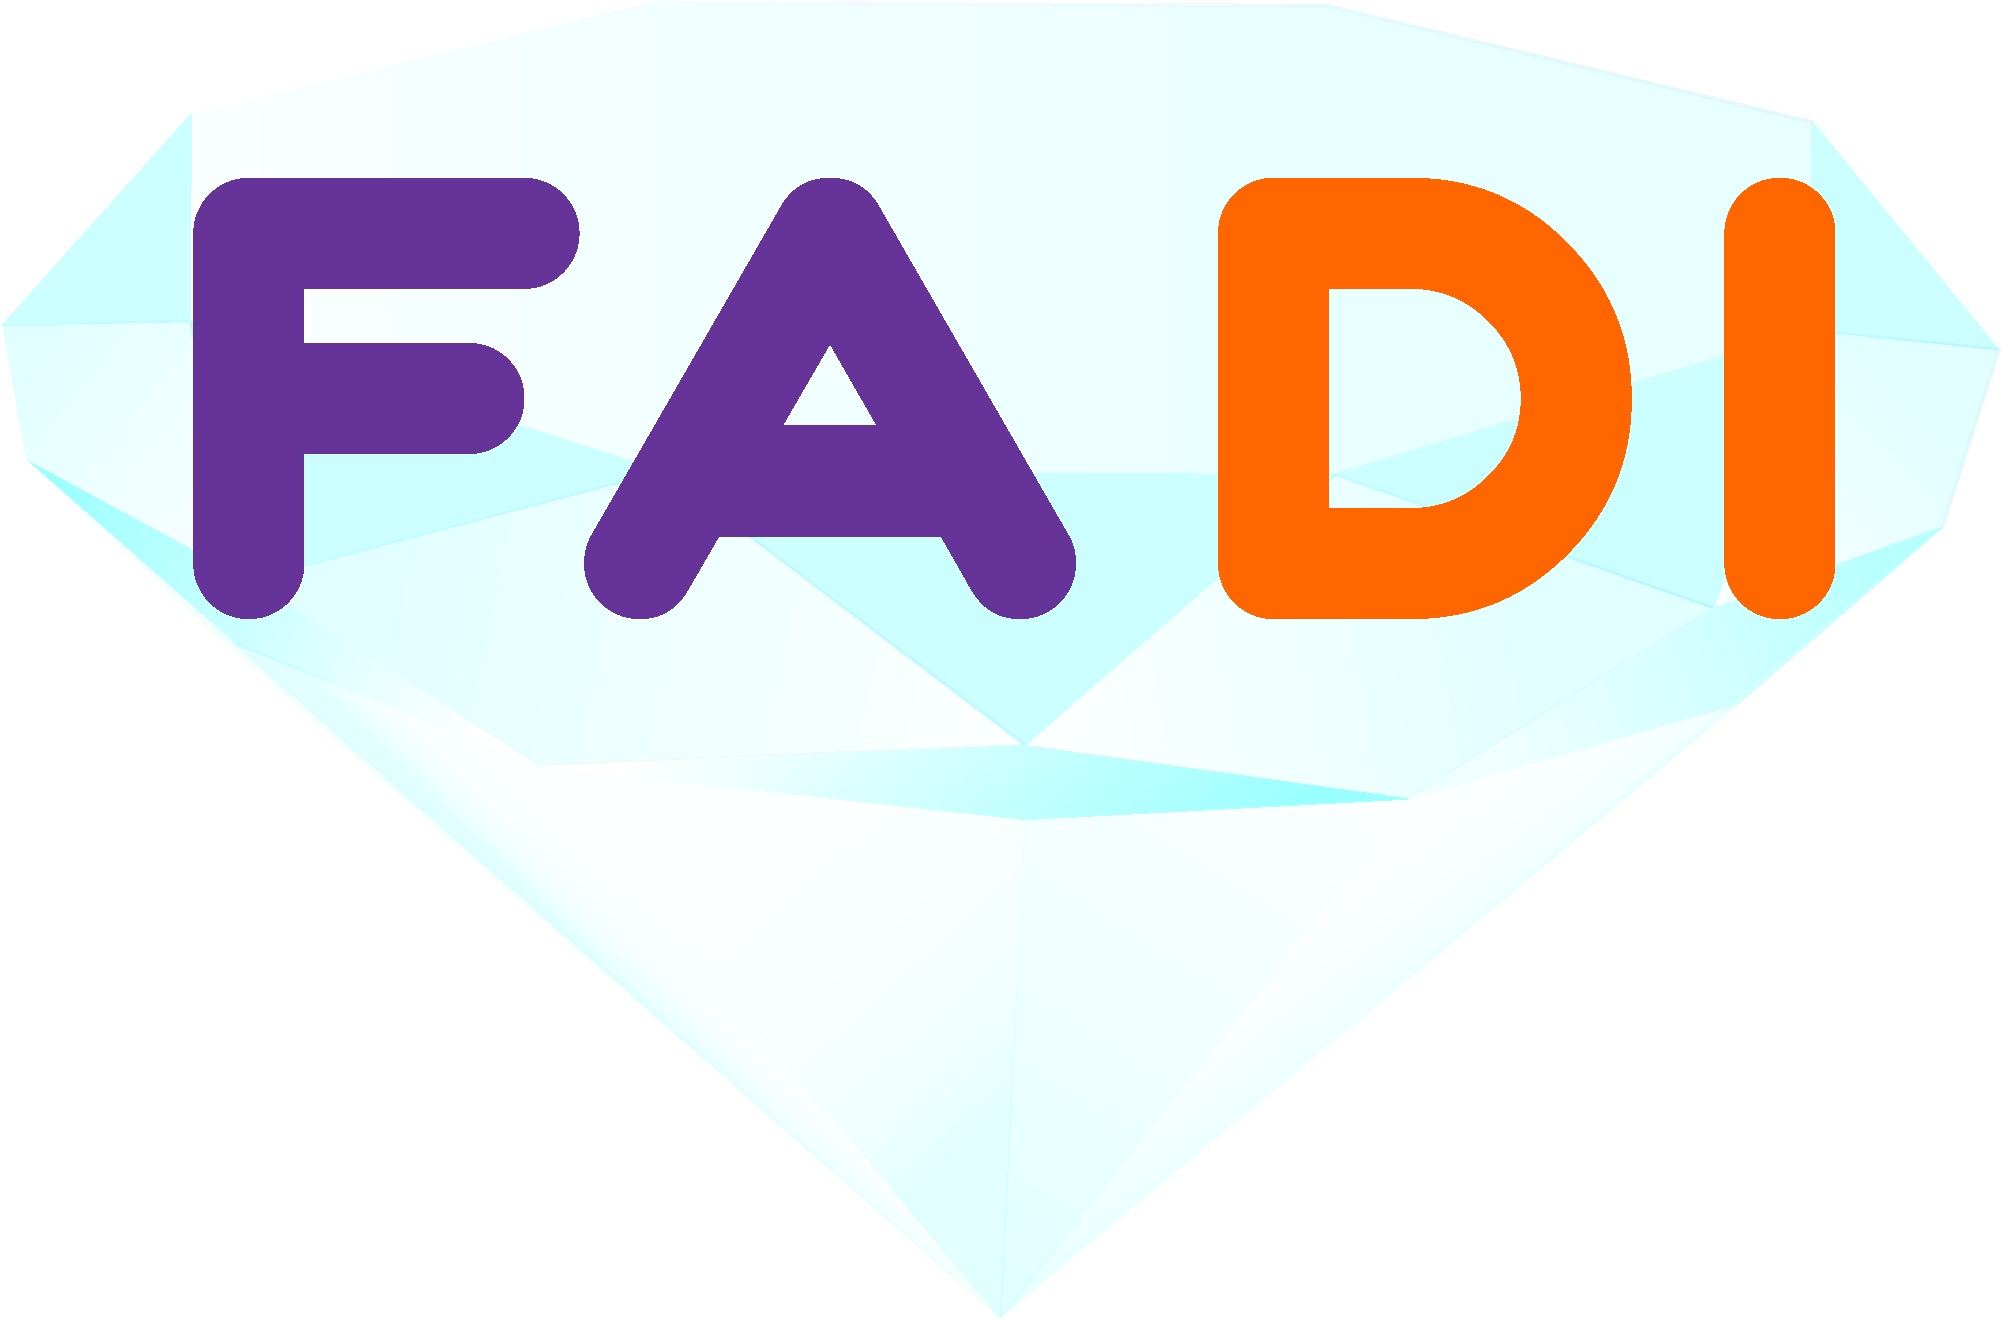 FADI JSC